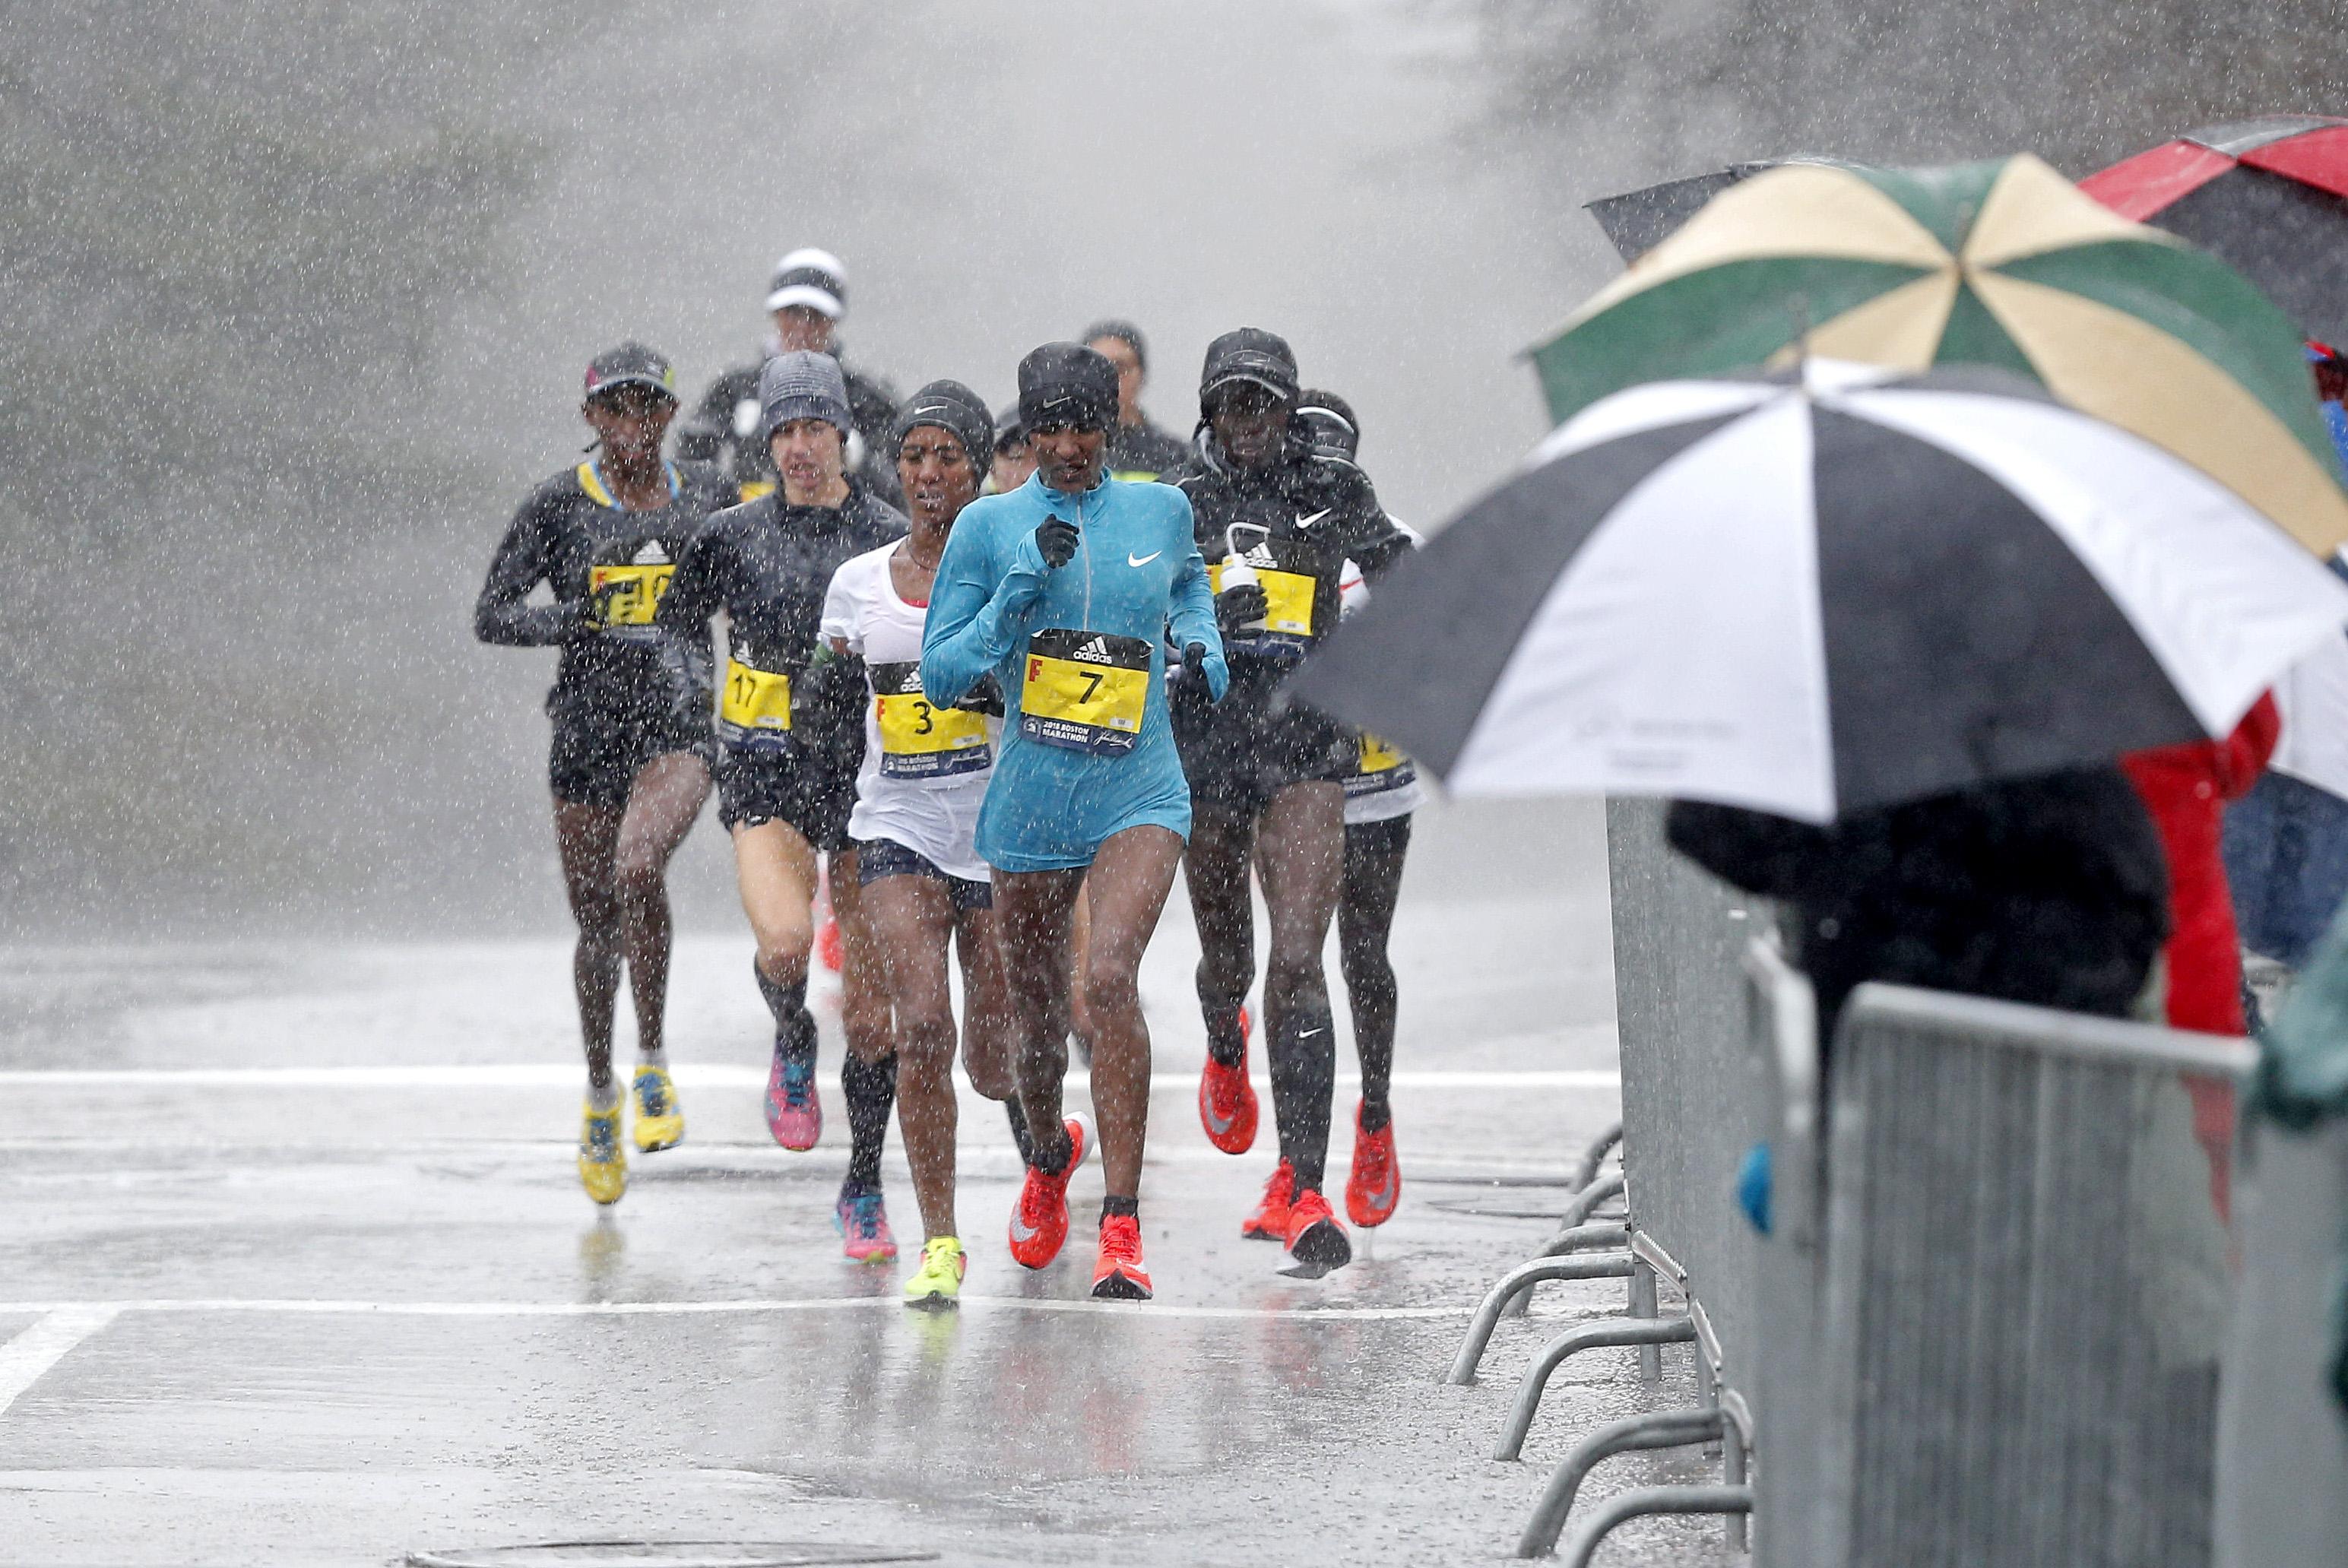 Mamitu Daska (ETH) leads the field during the 2018 Boston Marathon on Apr. 16, 2018